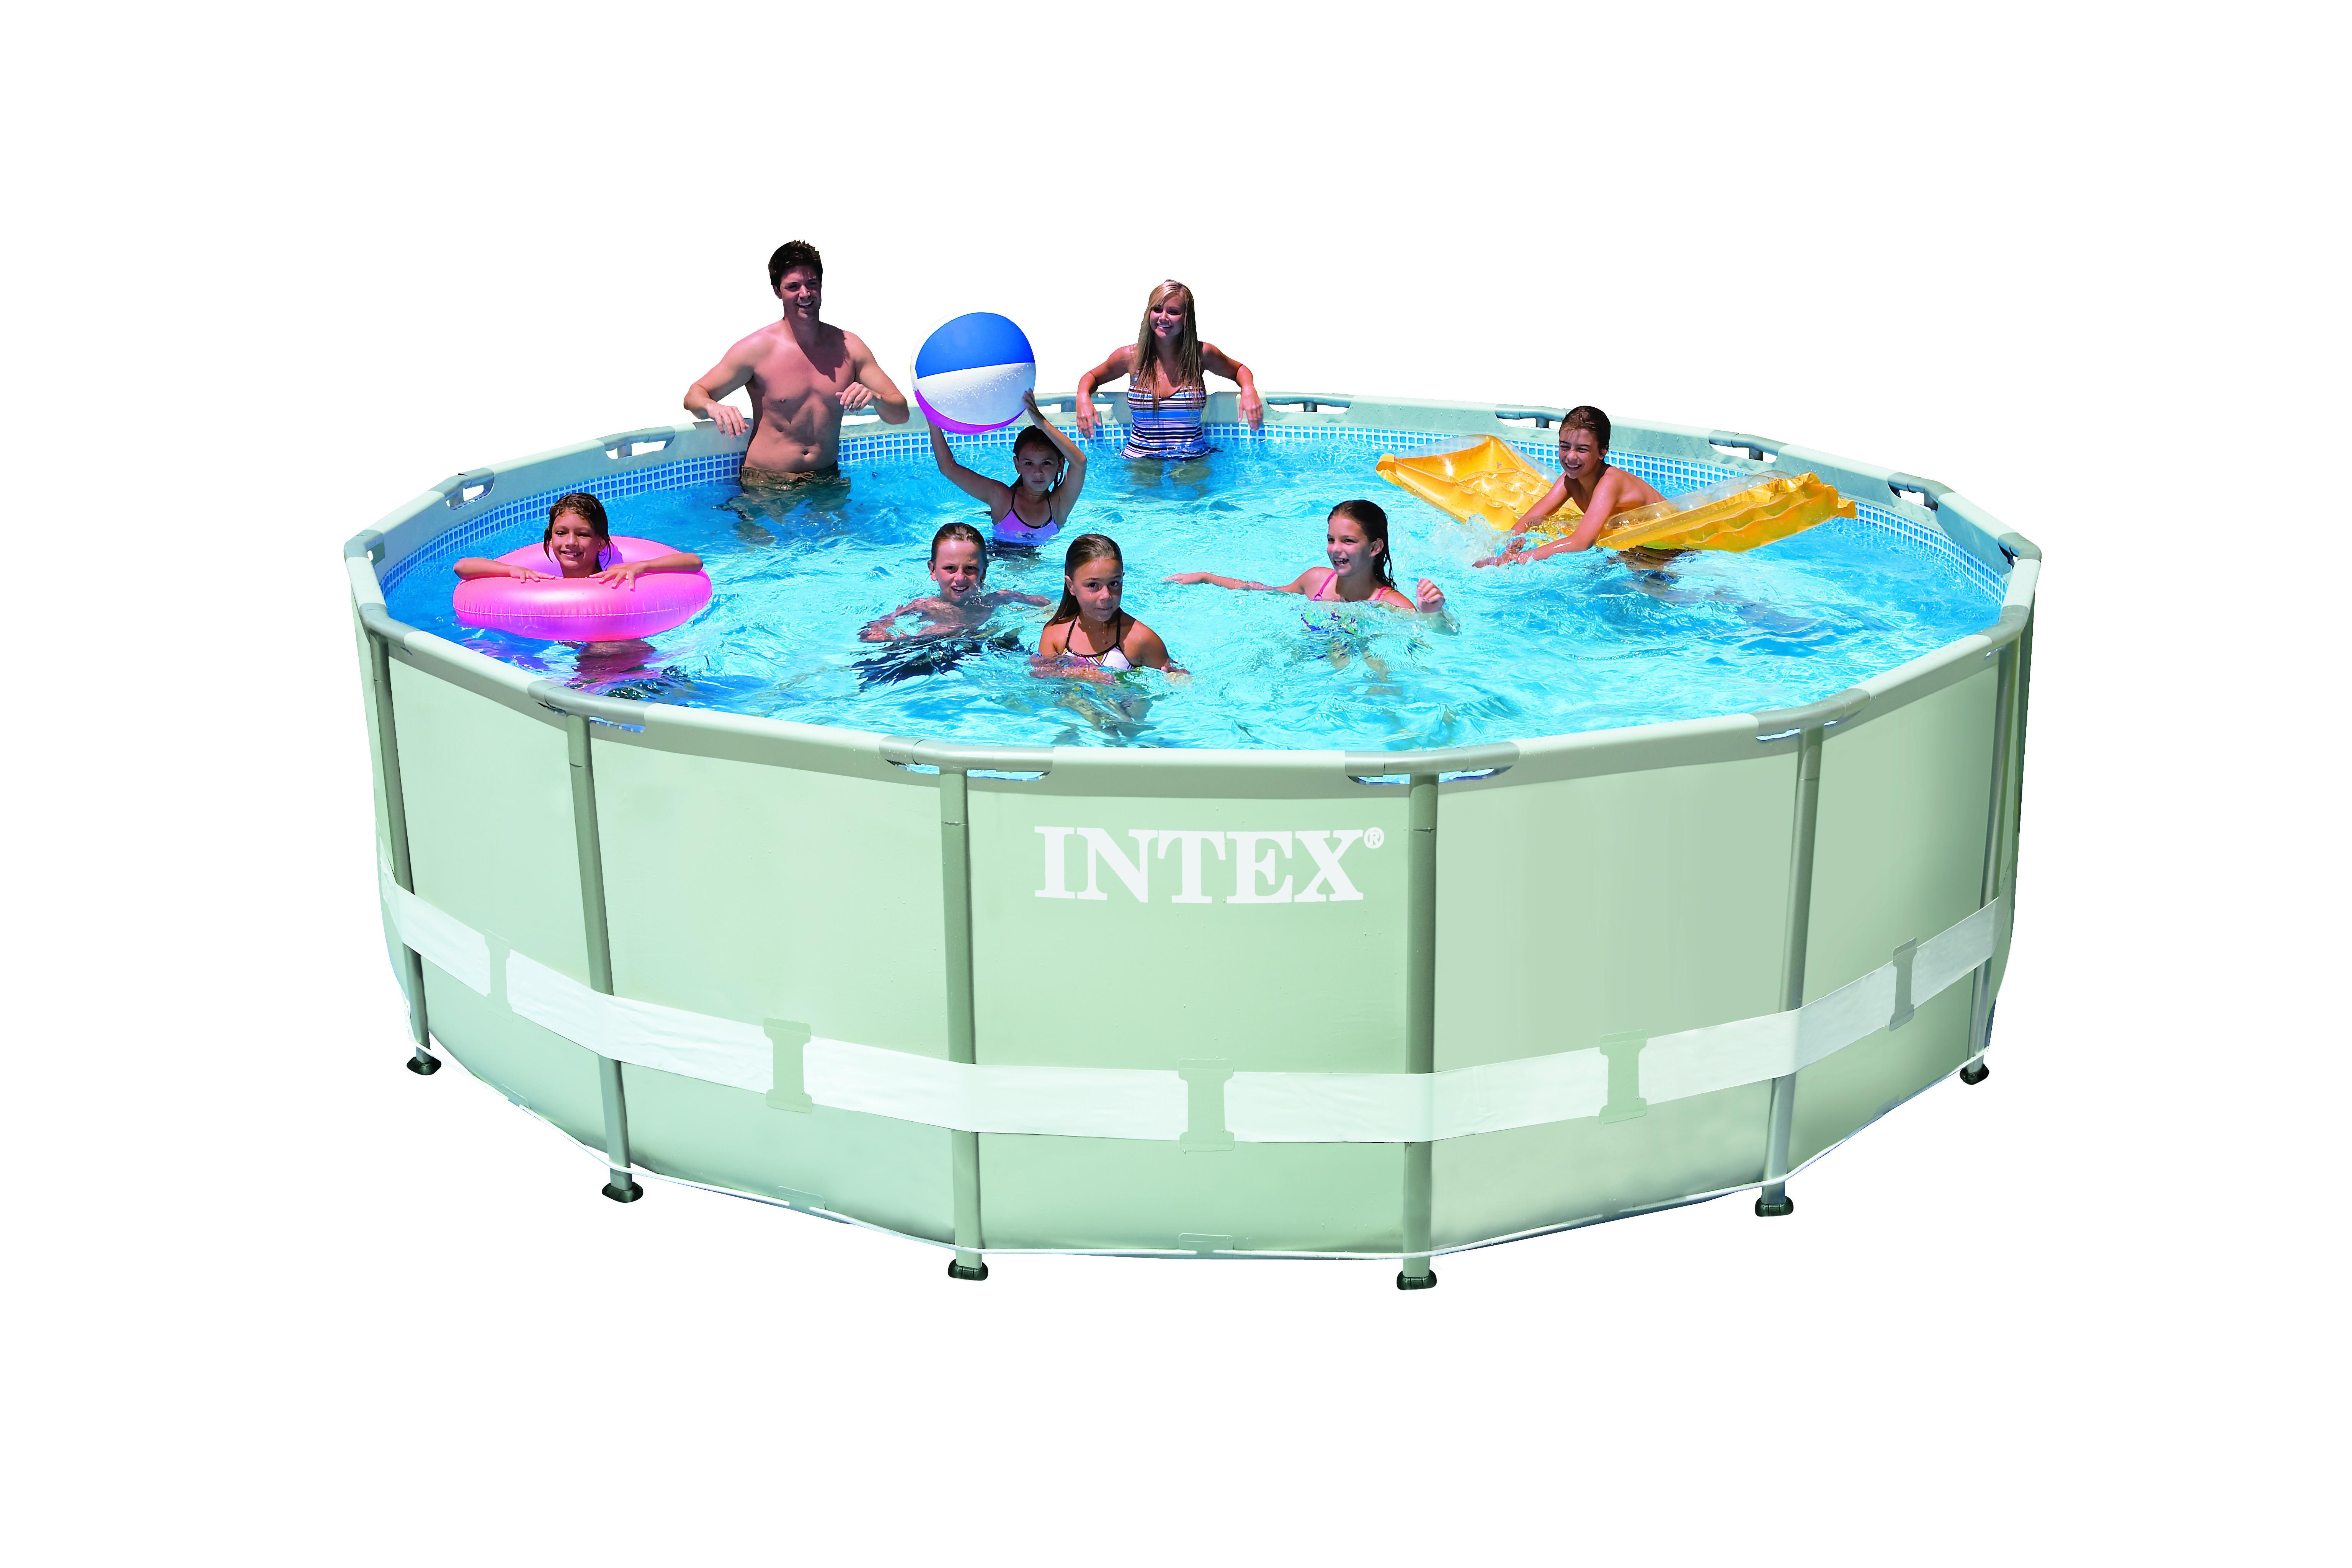 Intex ultra frame pool 427x107 cm set met filterpomp for Filterpomp zwembad intex